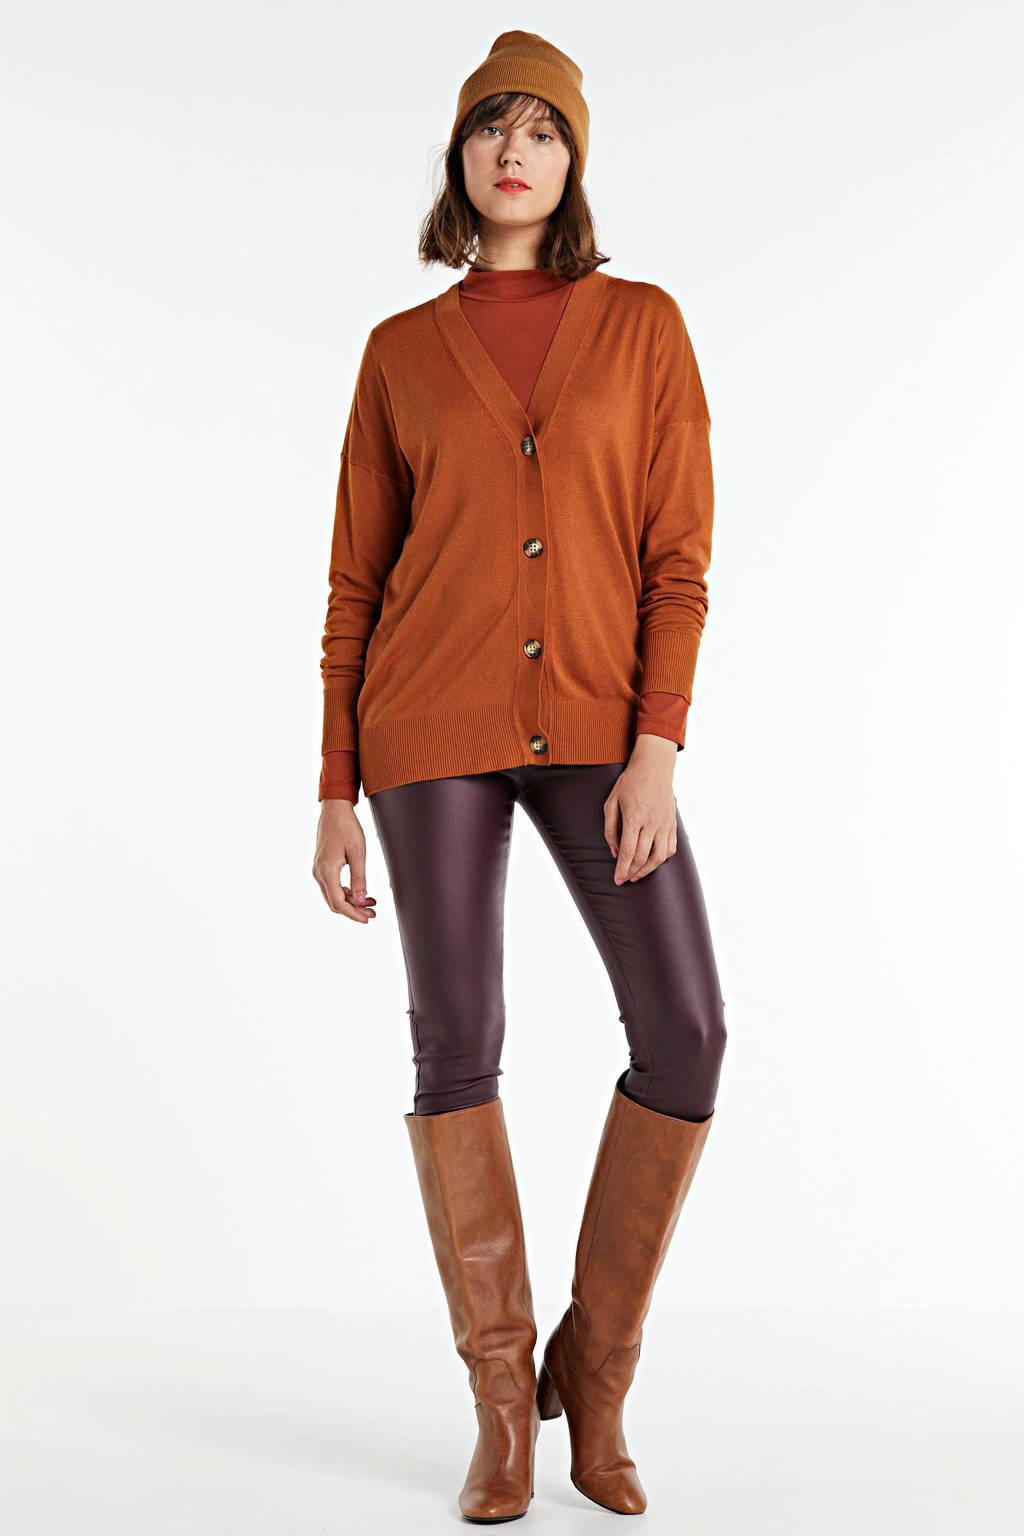 ESPRIT Women Casual vest bruin, Bruin